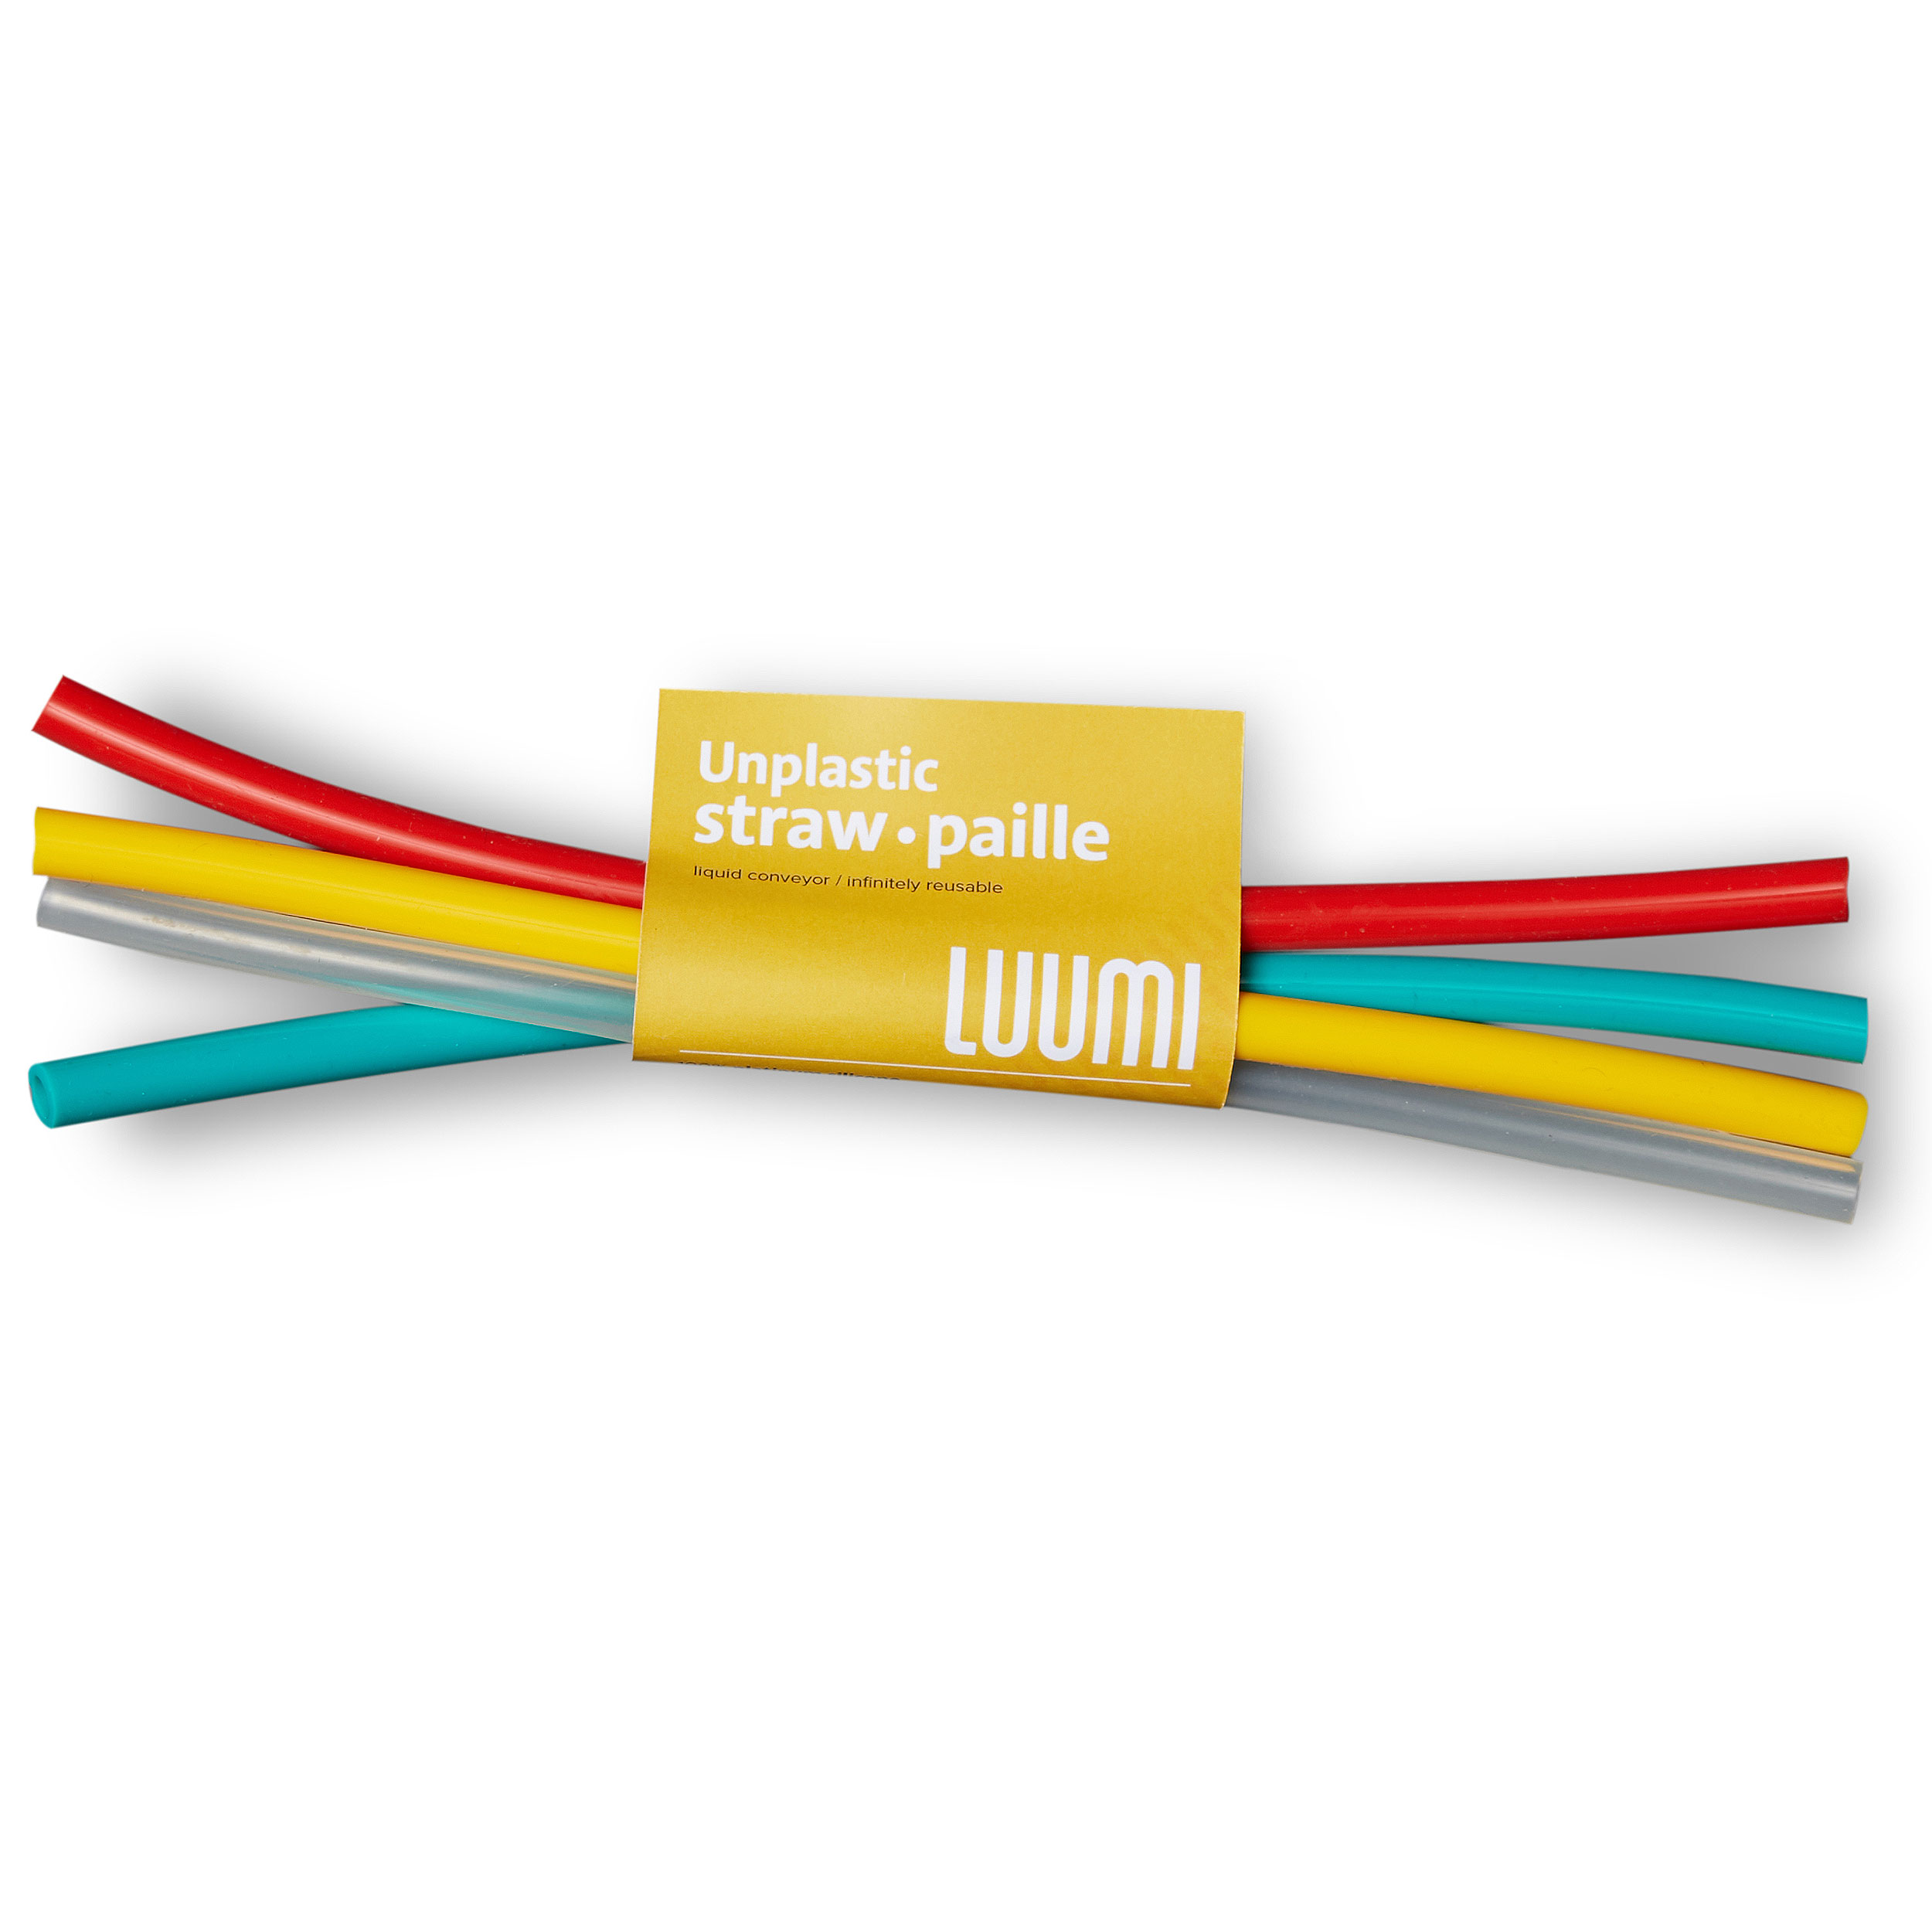 Unplastic Straws 4pk